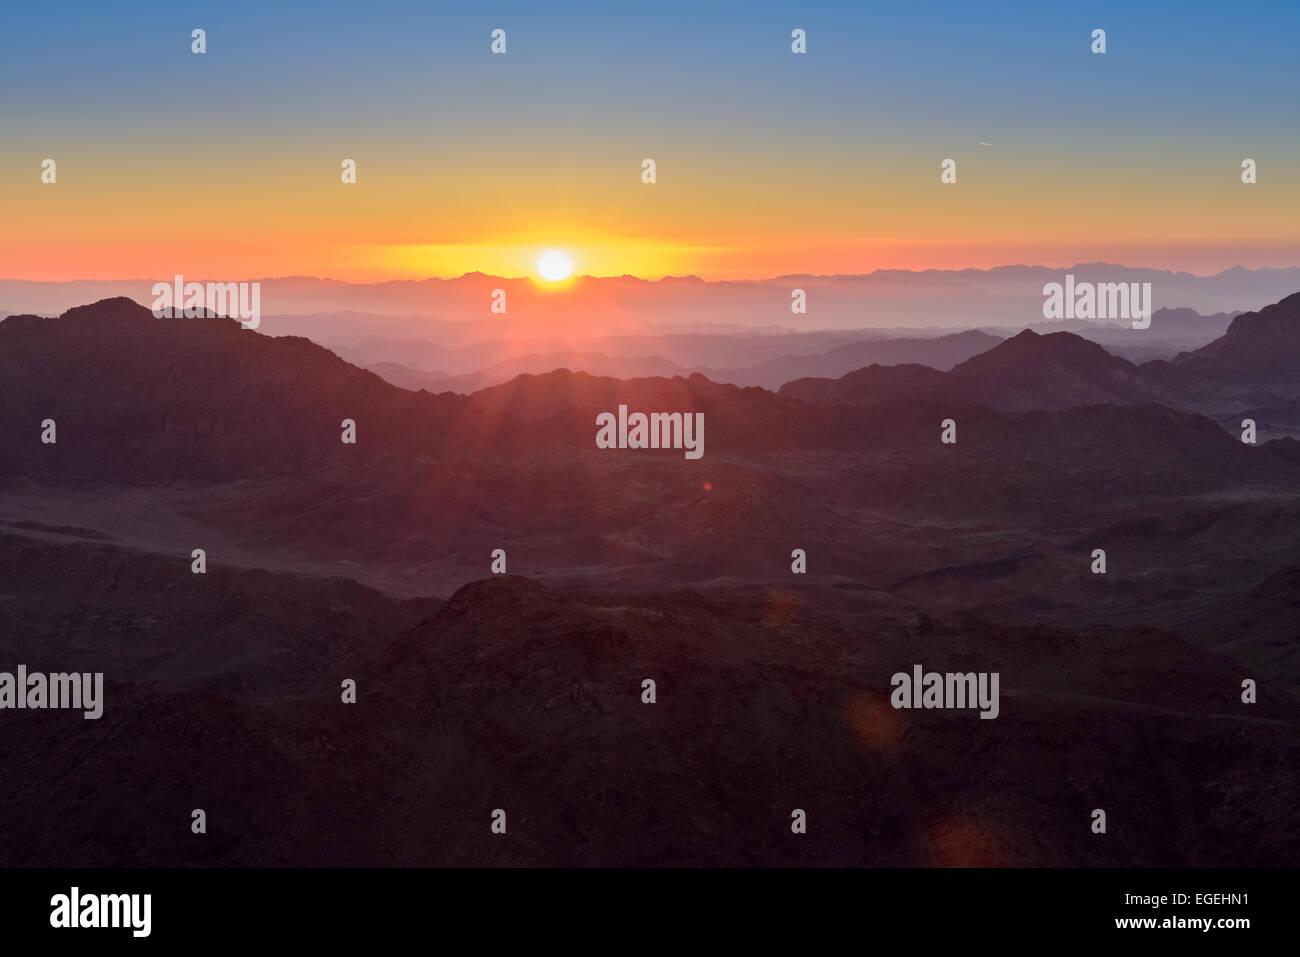 Sunrise at Mount Sinai, Egypt. Bedouins guide tourists in the night to Mount Sinai, Egypt to meet sunrise. - Stock Image